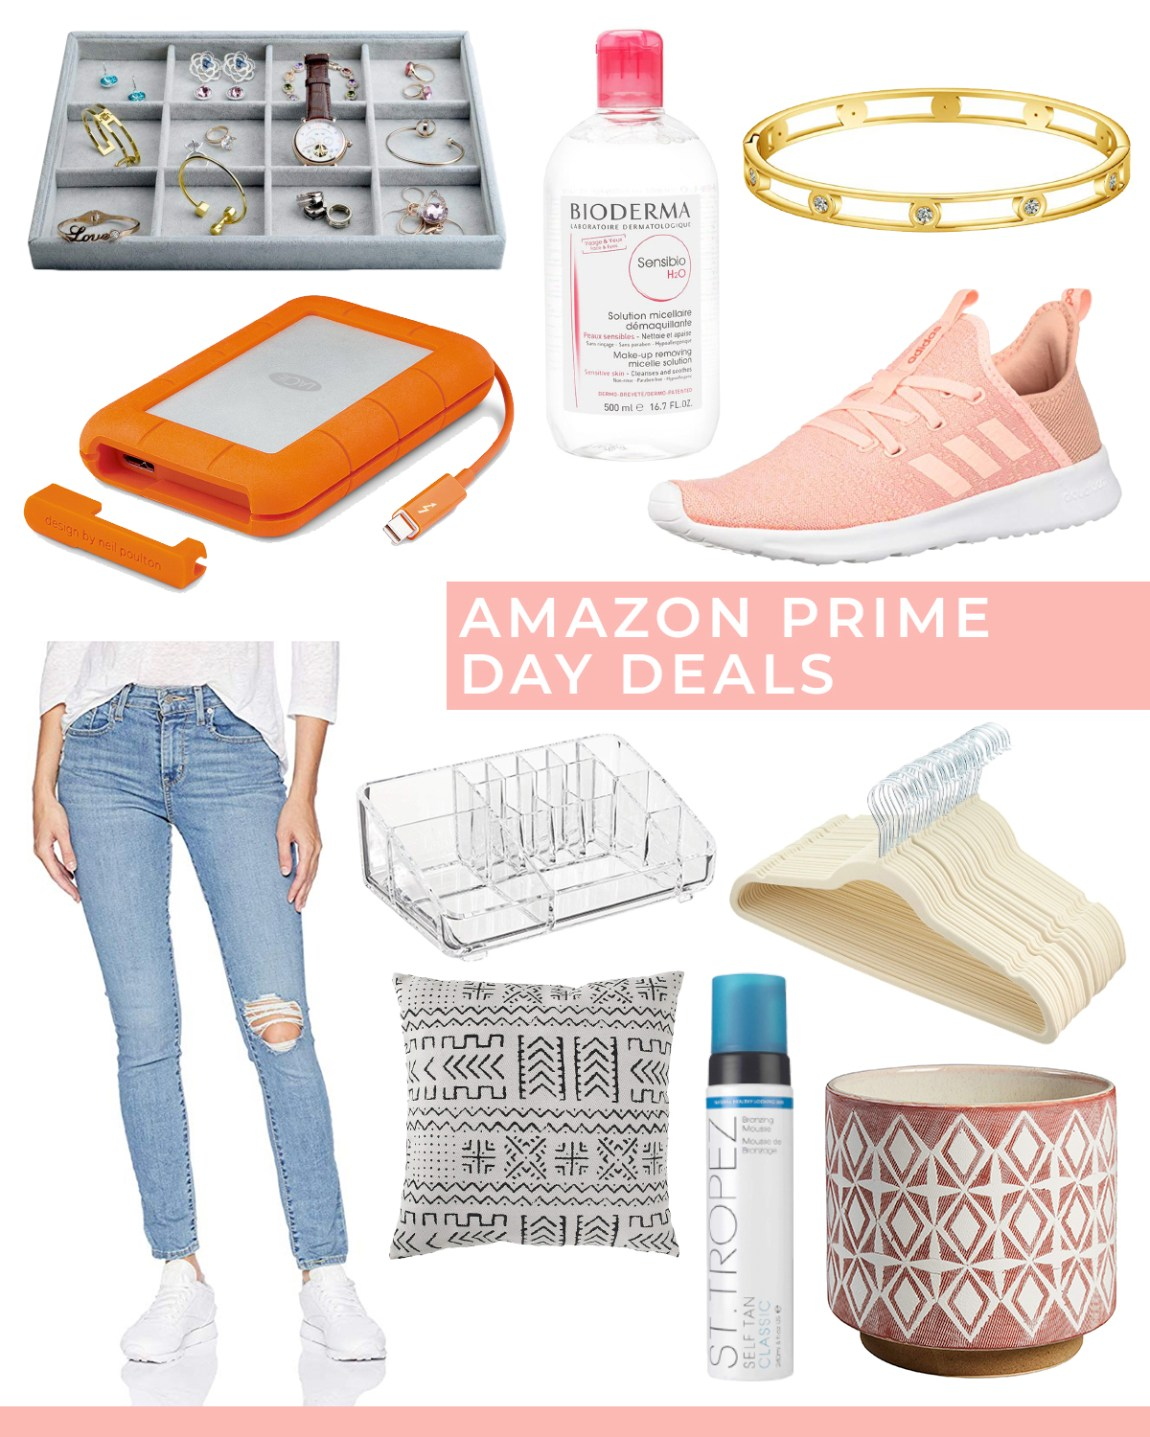 Amazon Prime Day Deals - My Picks // wanderabode.com